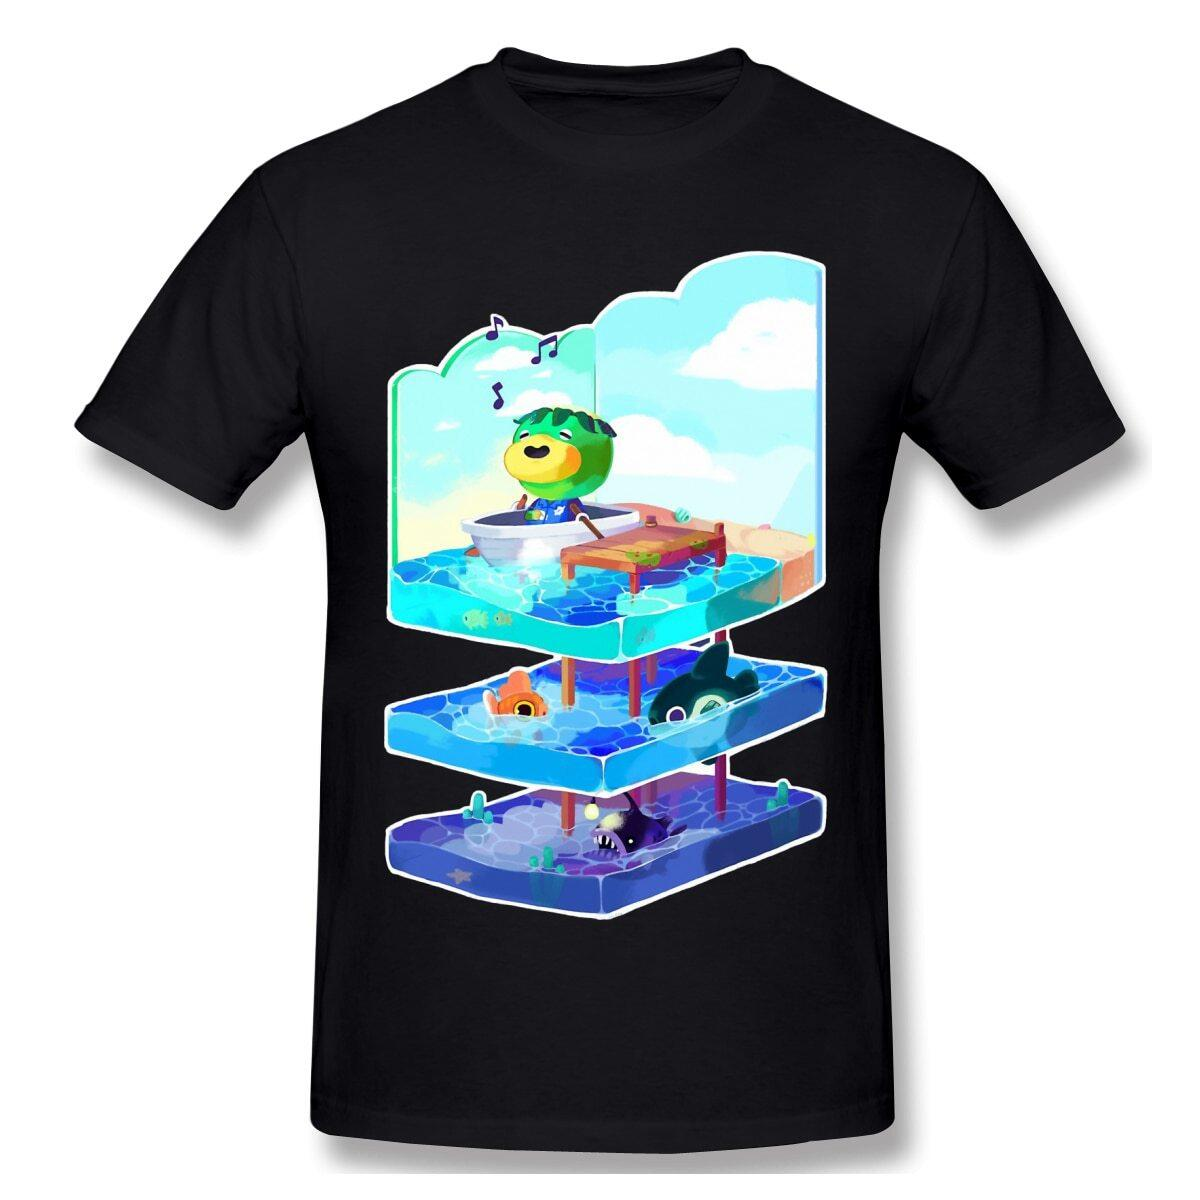 Animal Crossing Kappin' Adventure Layers Shirt, Black / XXXL